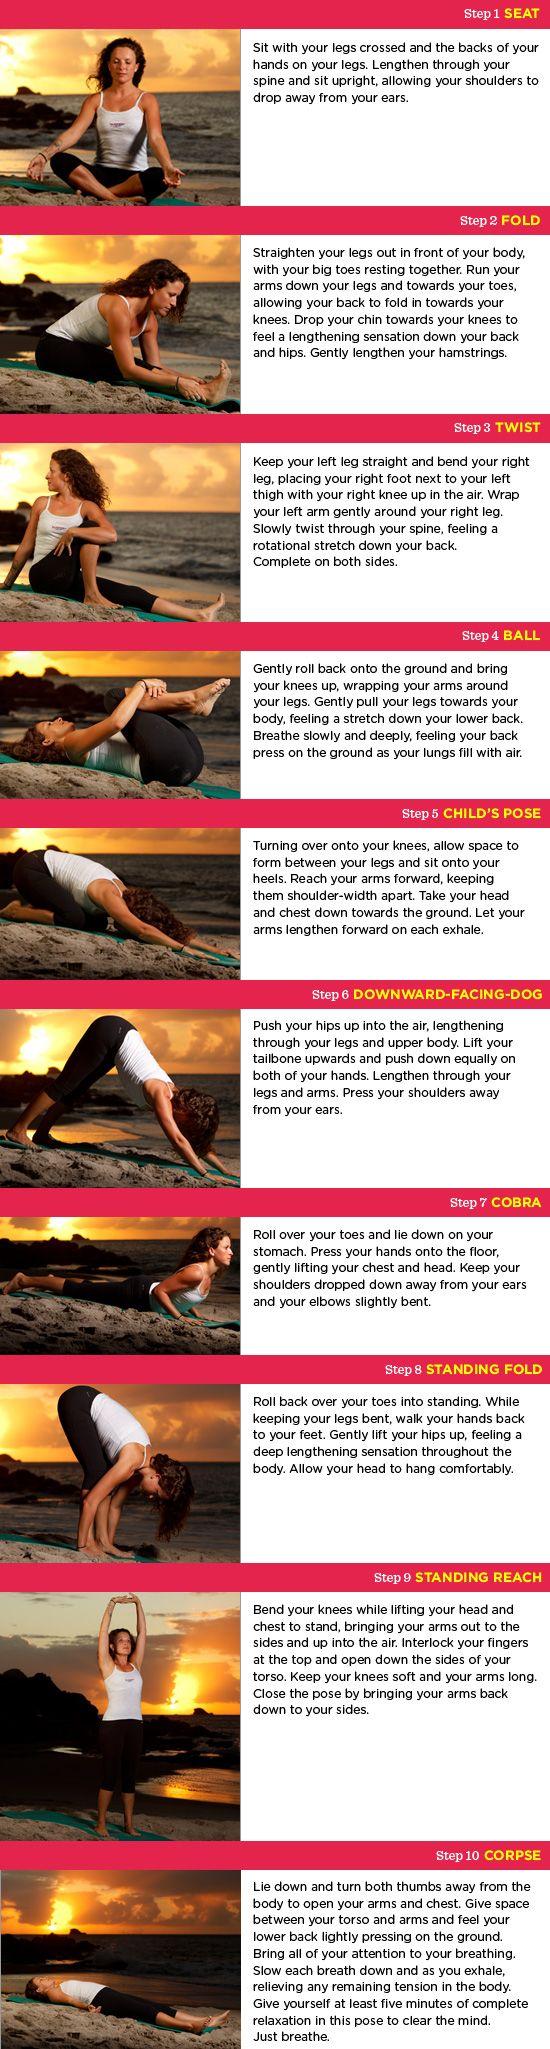 Morning yoga.every morning